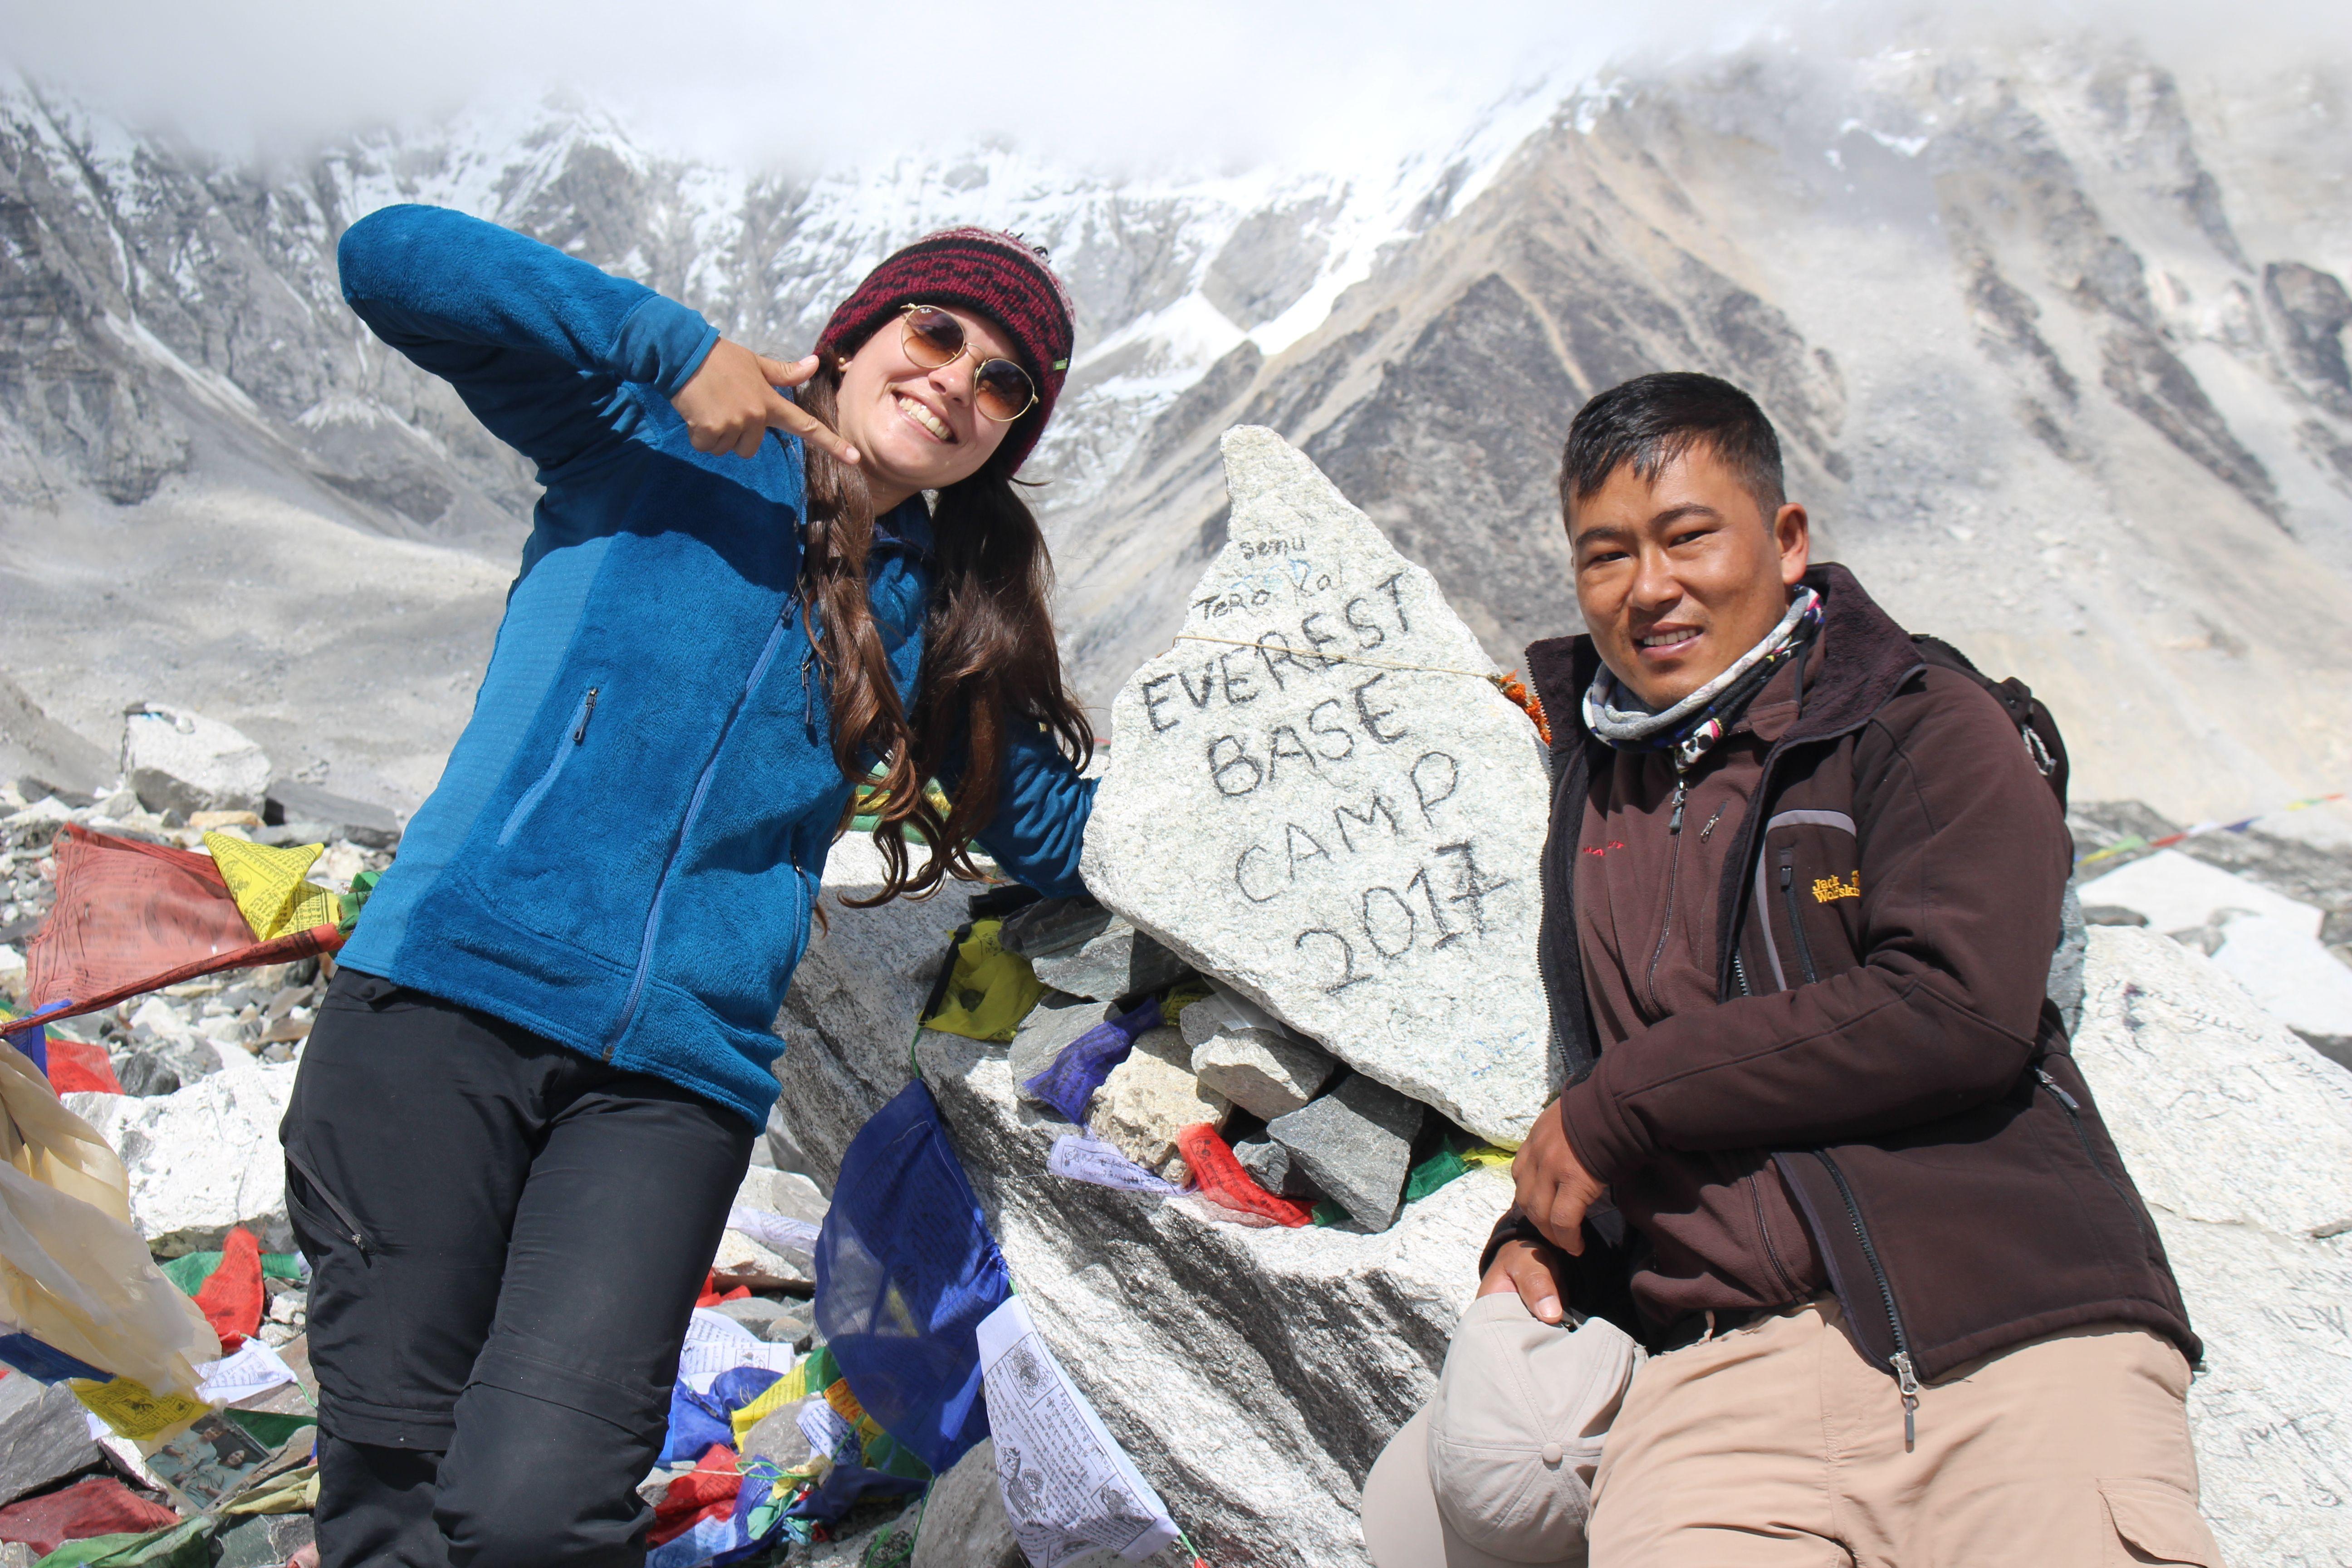 Everest base camp trek from everest routes everest base